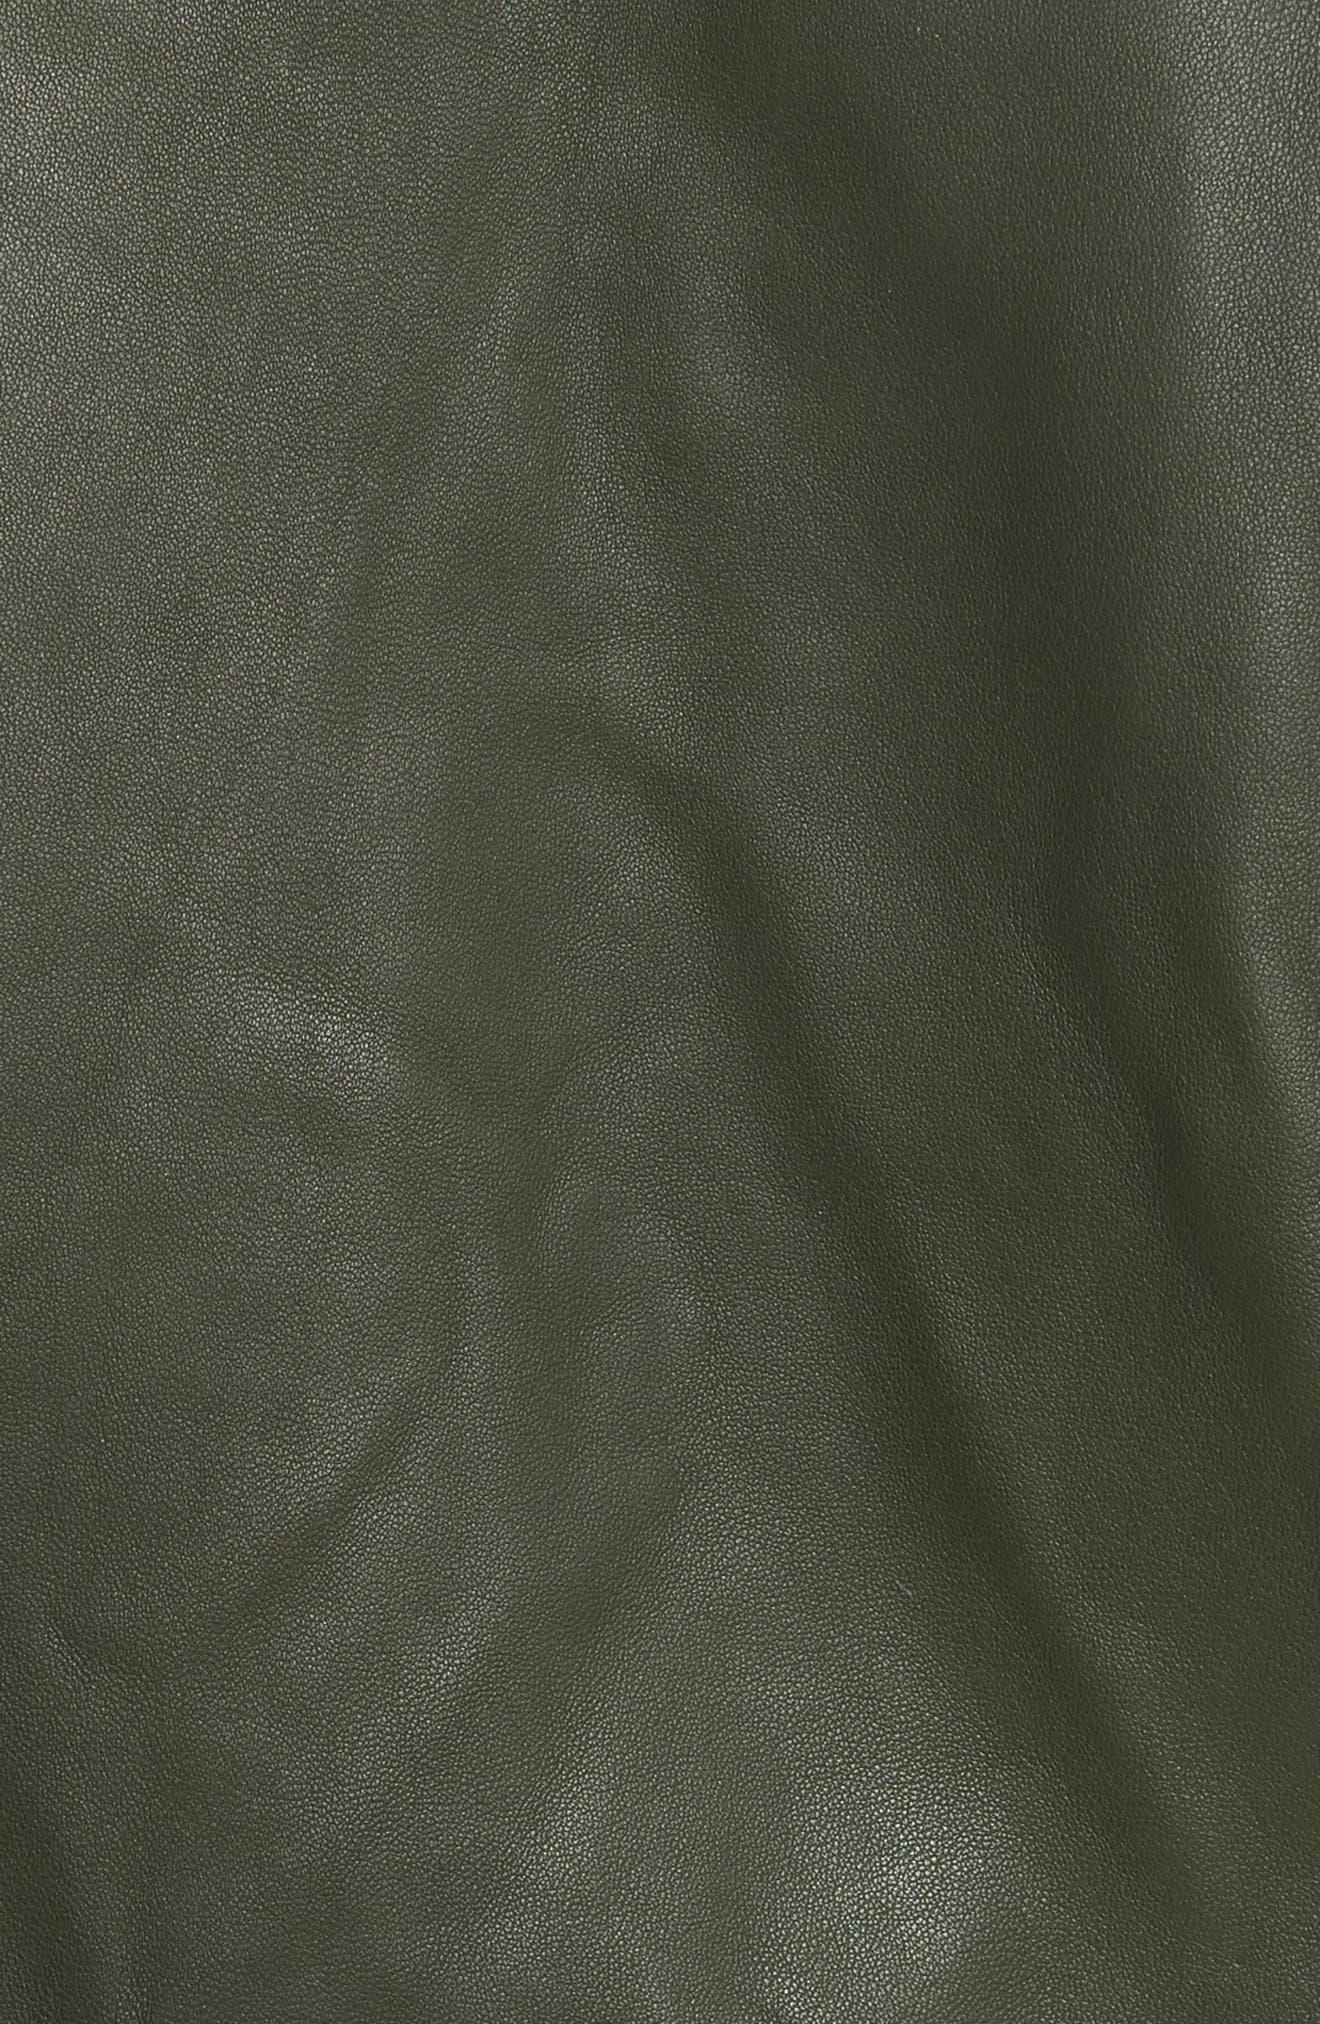 Jayne Orion Lambskin Leather Moto Jacket,                             Alternate thumbnail 5, color,                             Green